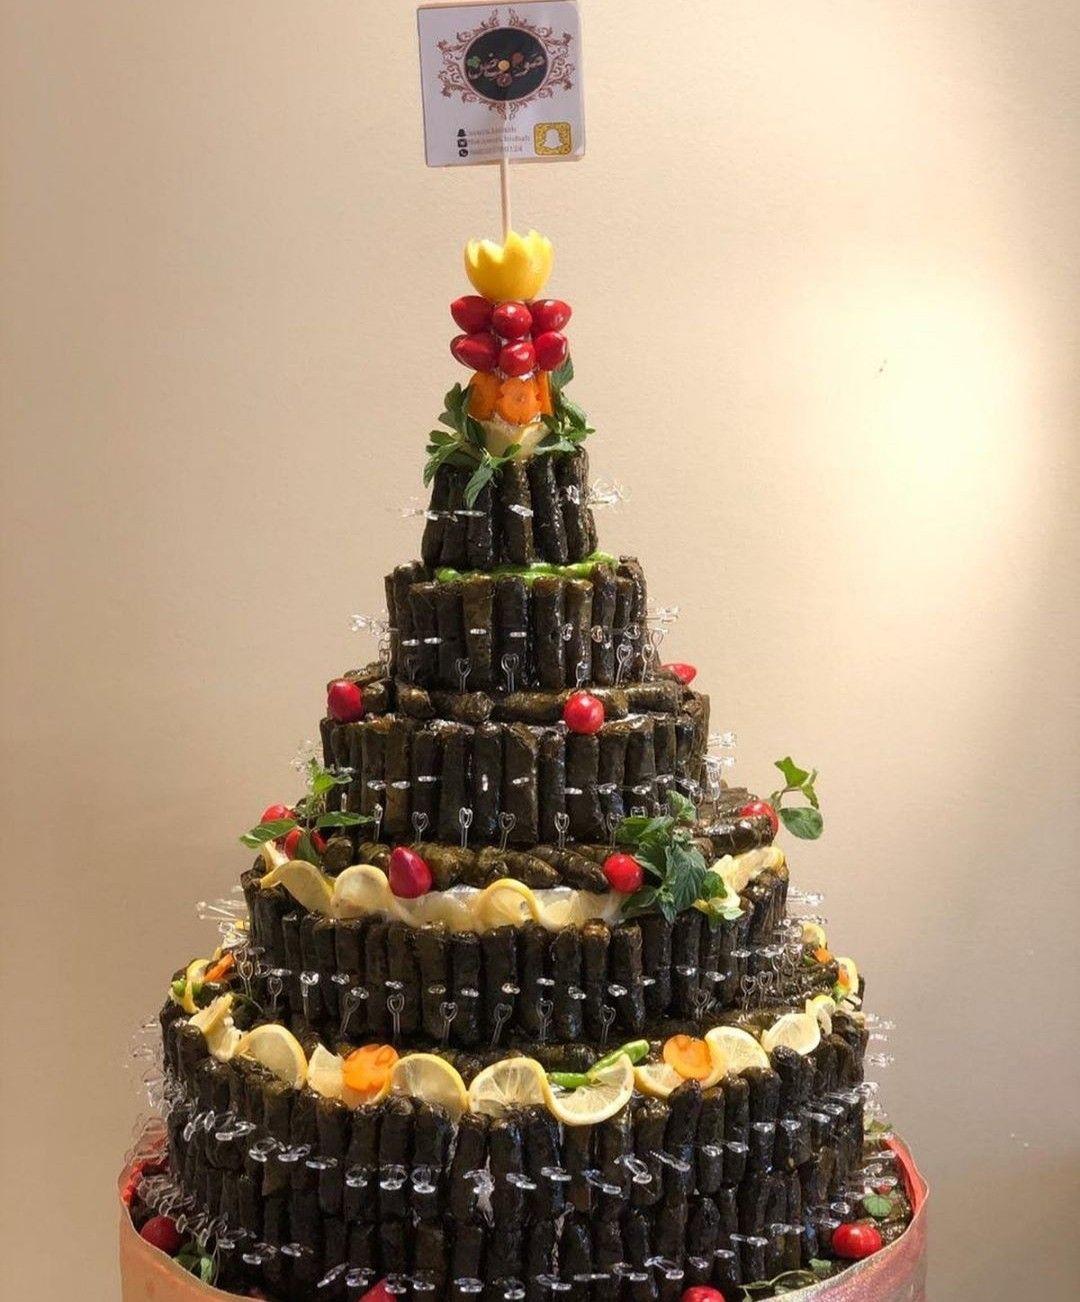 Pin By Haidy On توزيعات وضيافه Desserts Cake Food